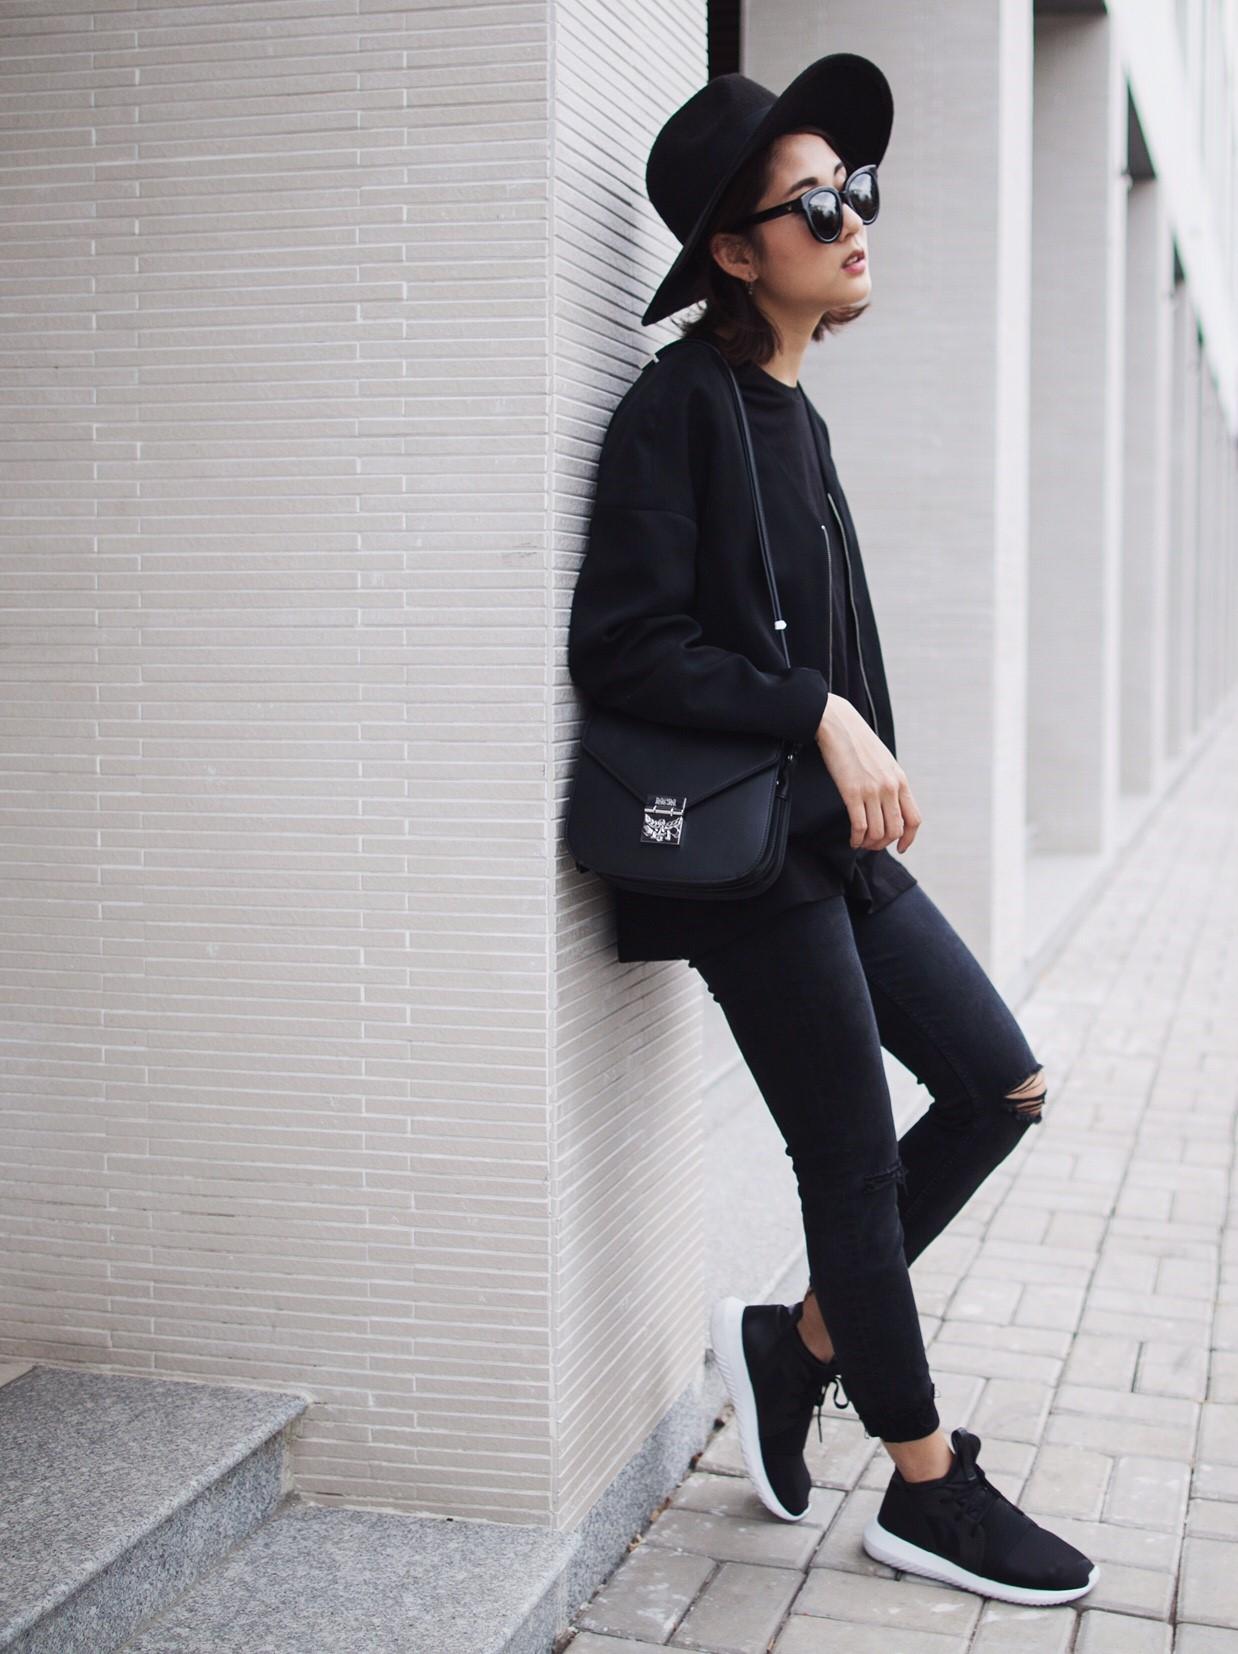 Sao & fashionista Việt thi nhau khoe street style hiện đại - Ảnh 2.